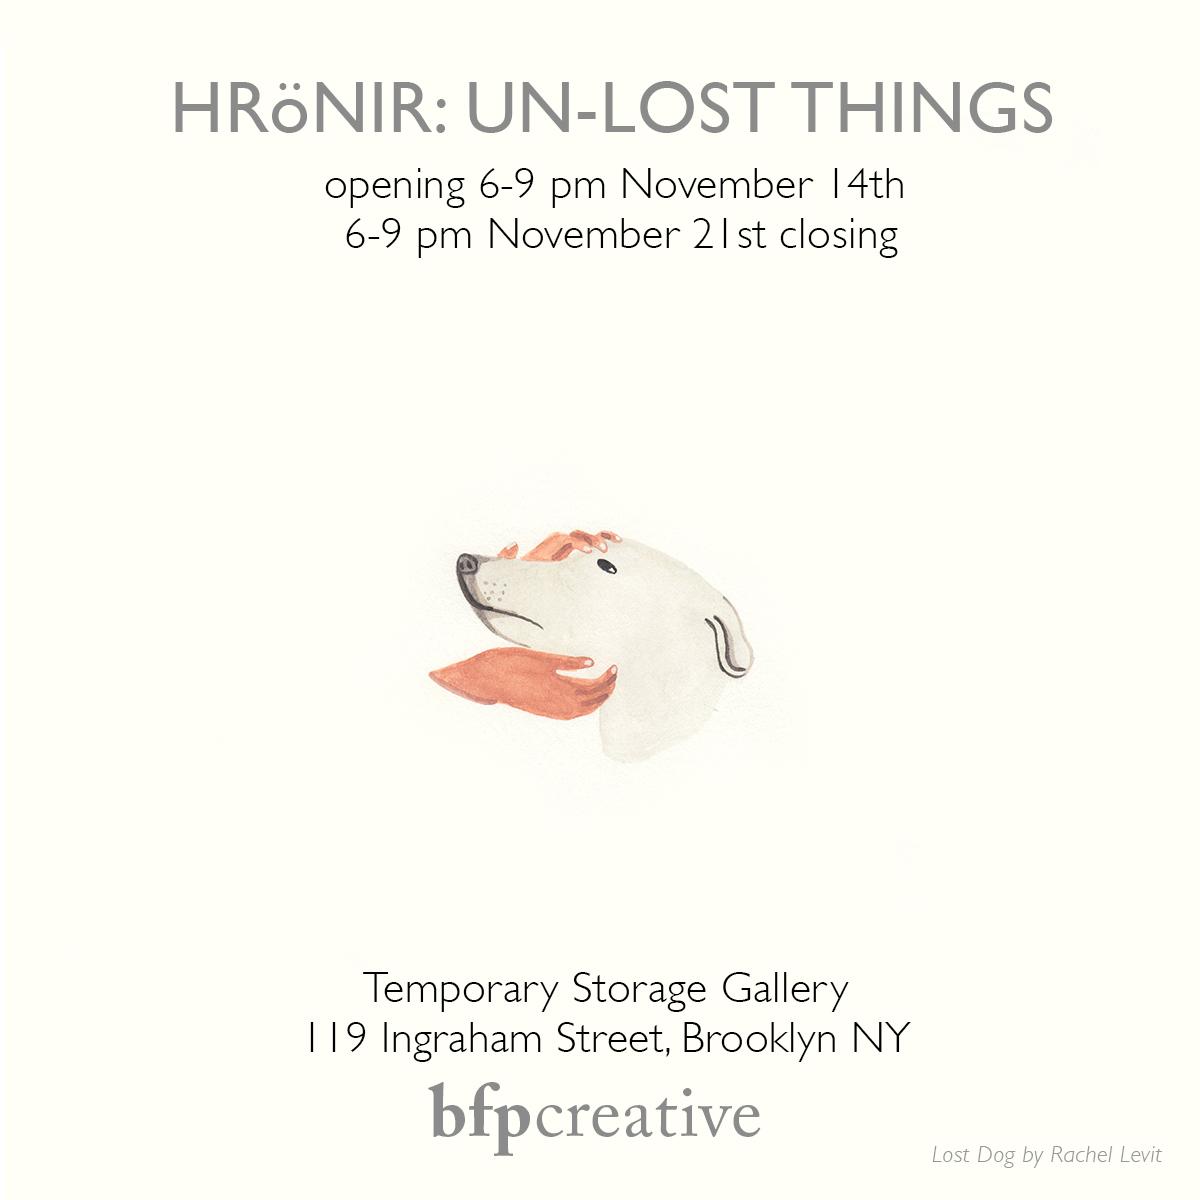 Hrönir: Un-Lost Things invitation. Image by Rachel Levit.